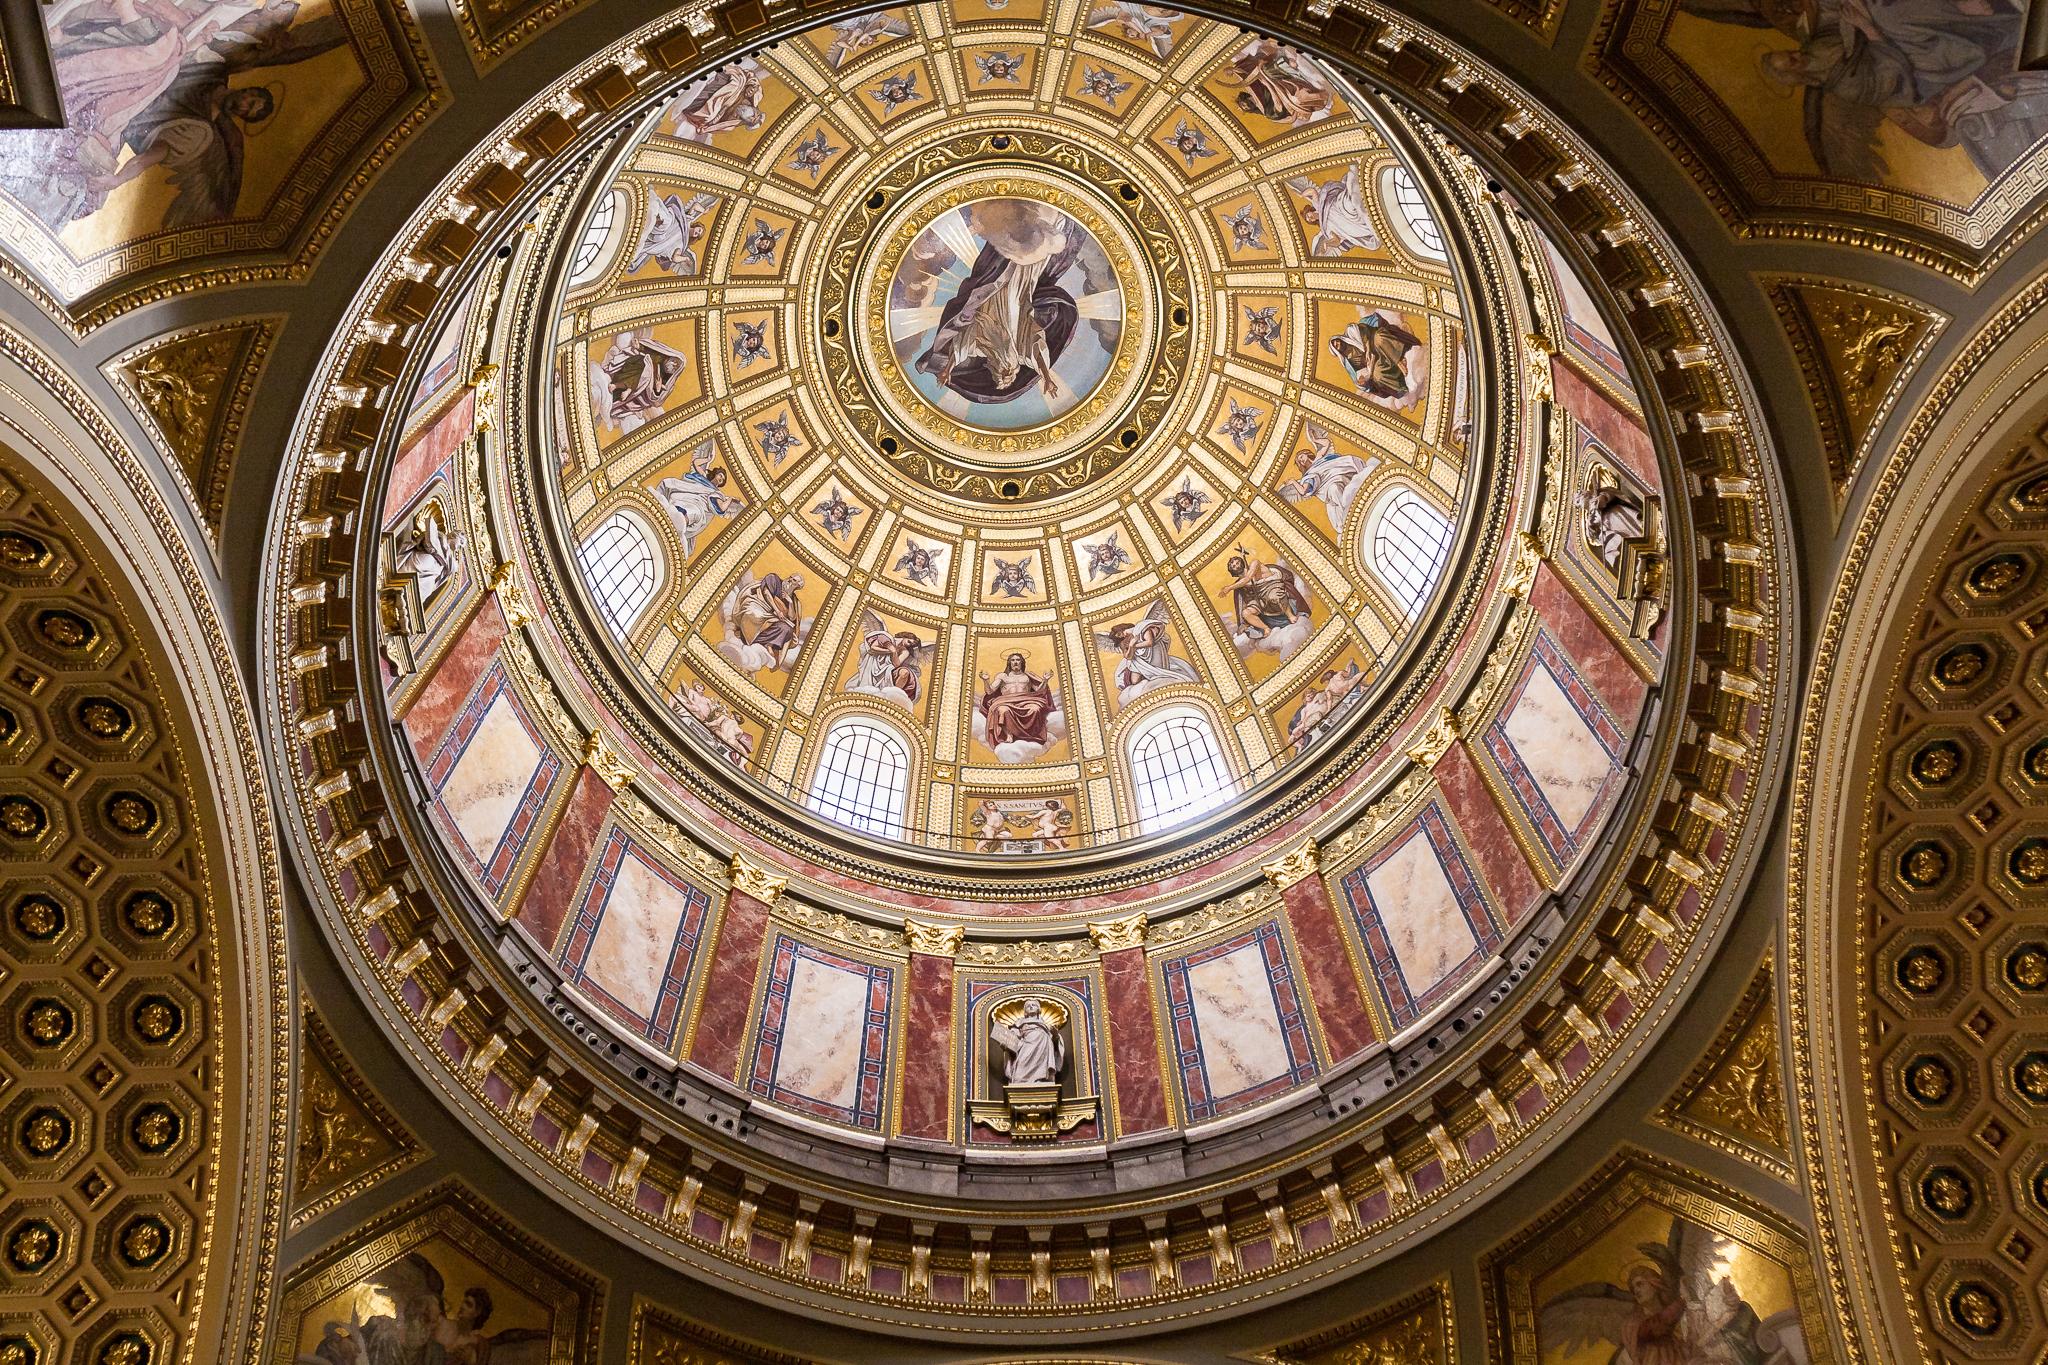 St Stephen's Basilica Dome